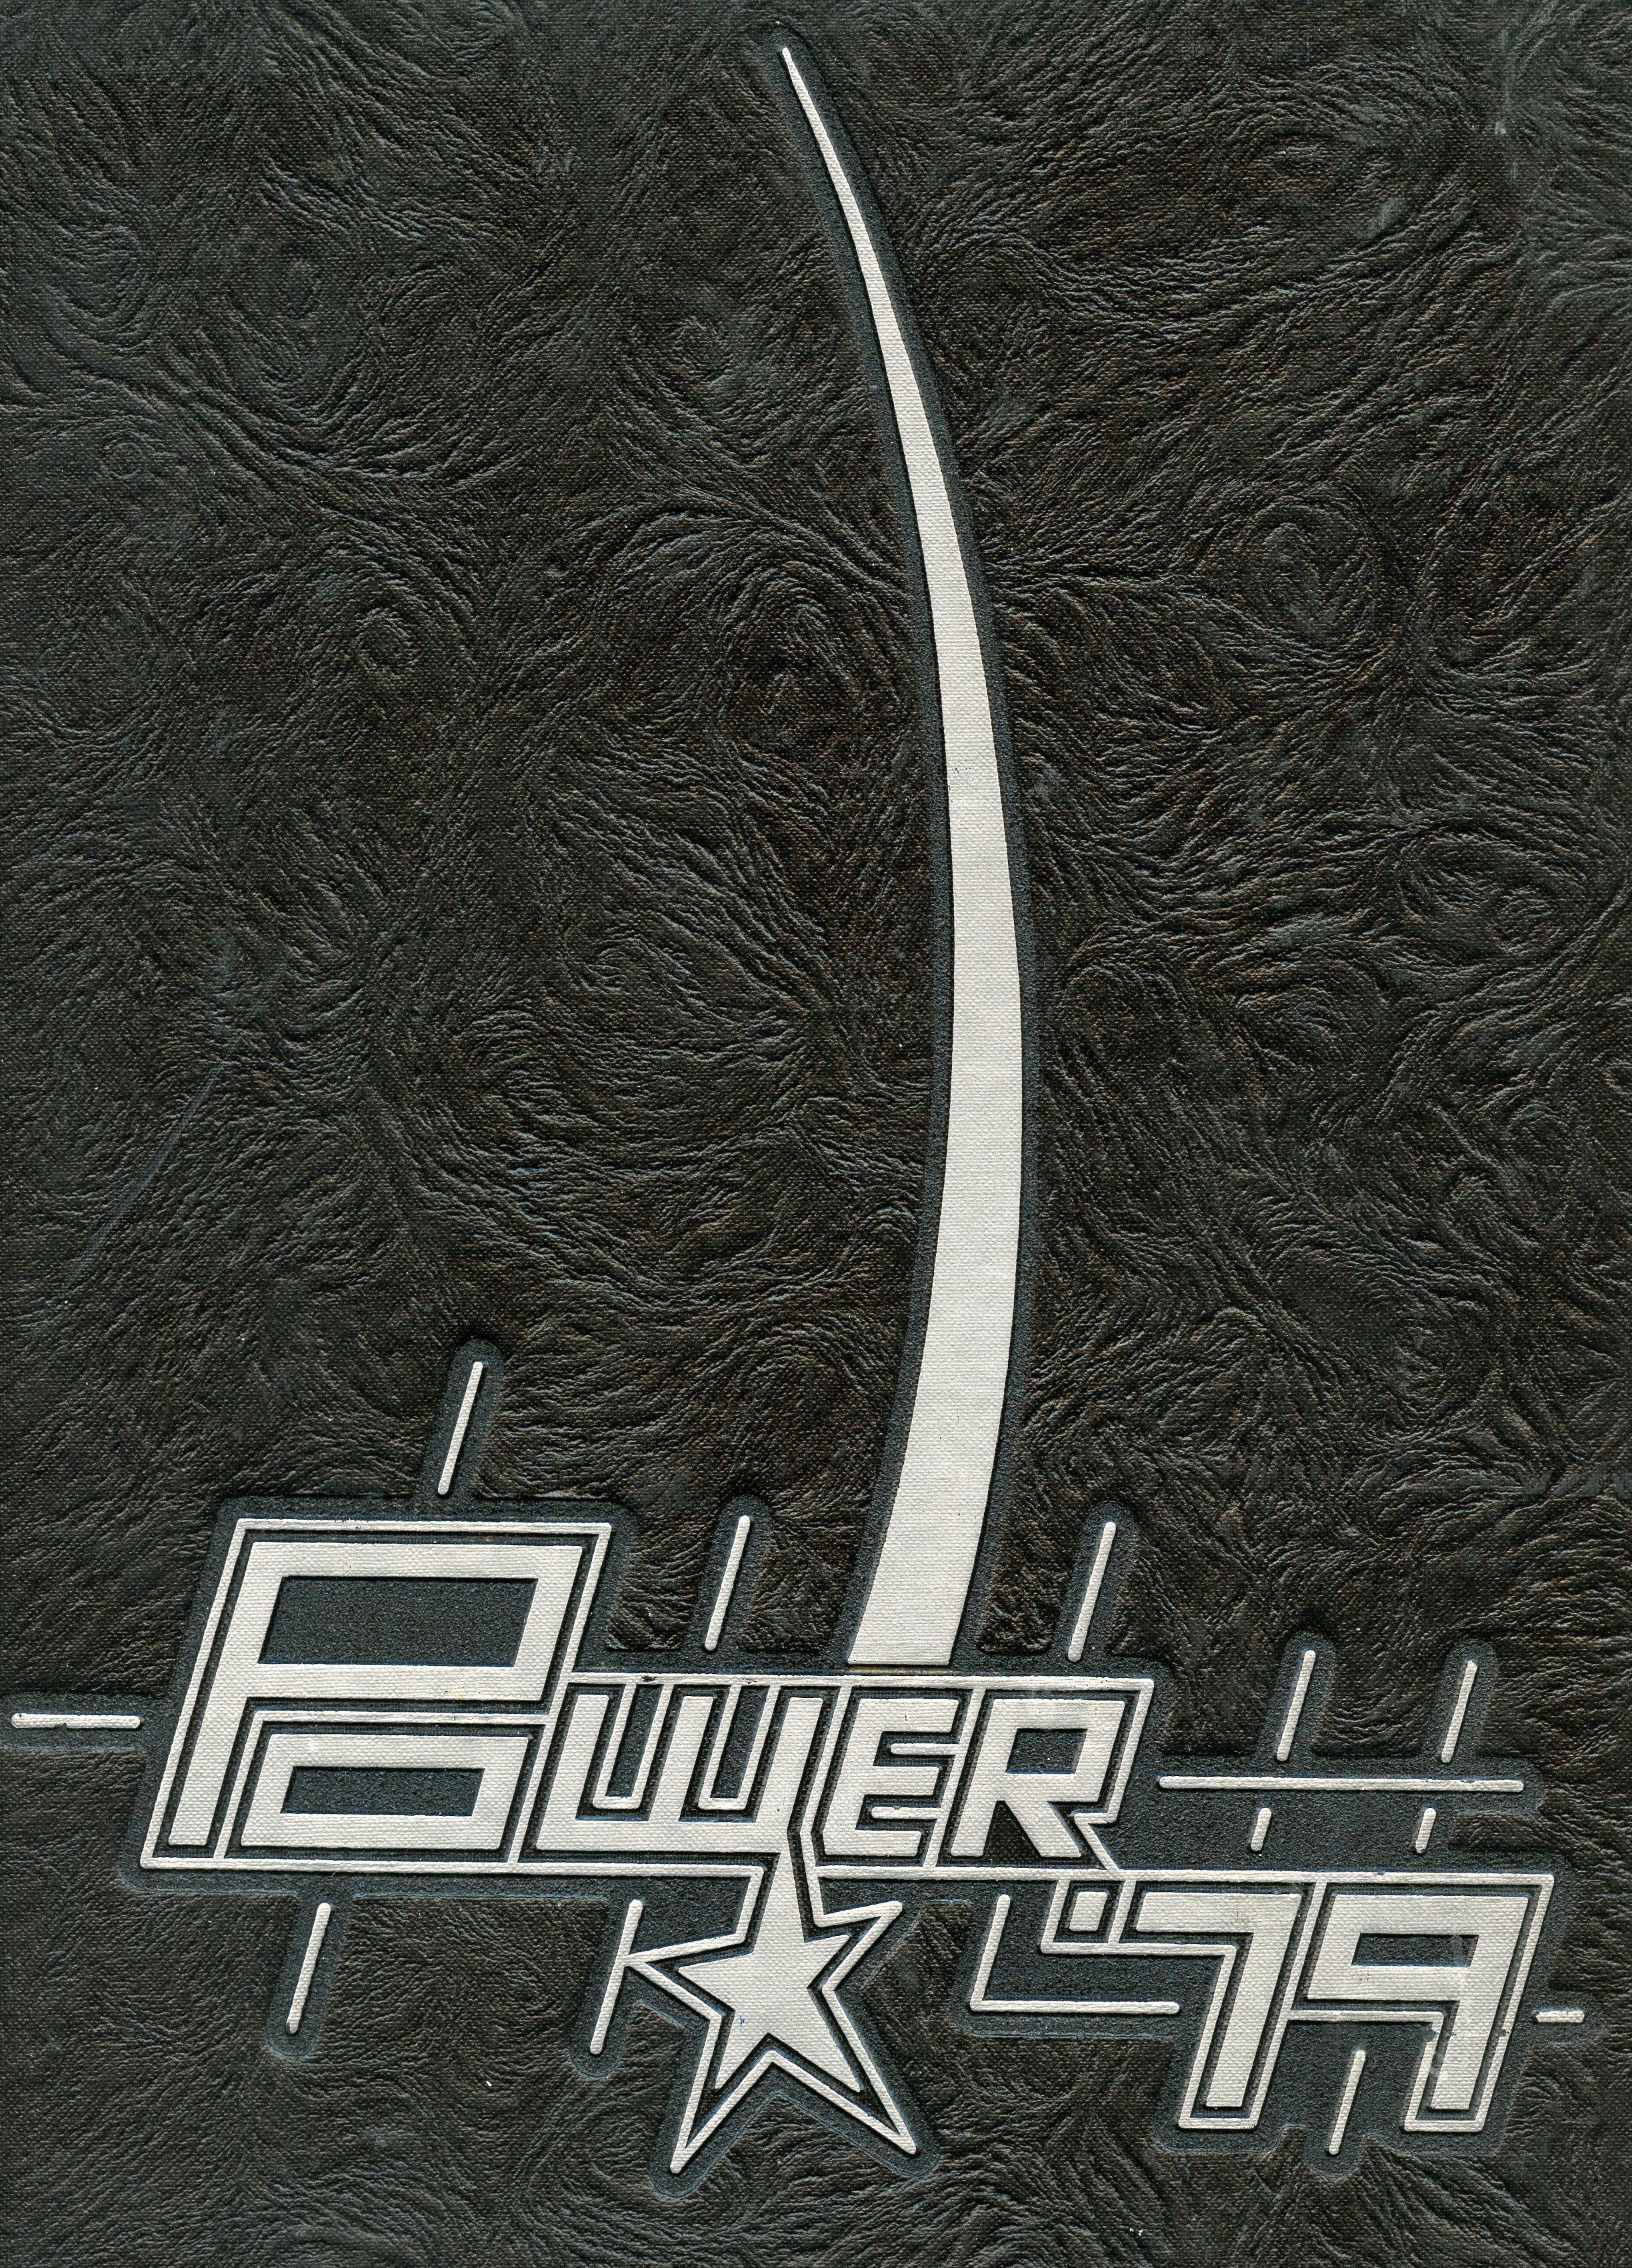 Power 1979